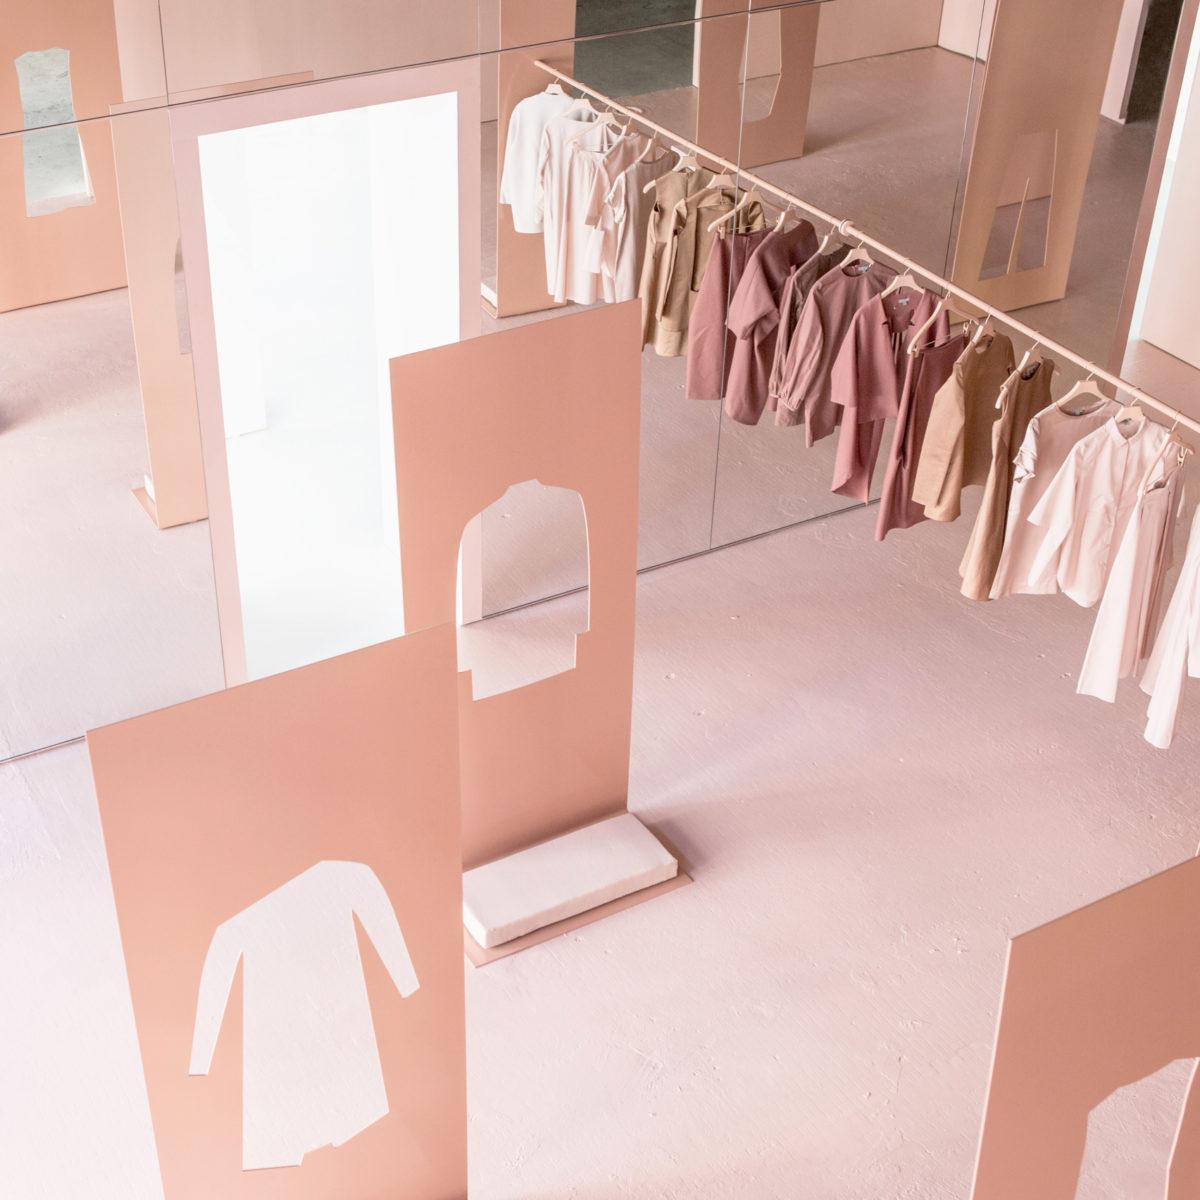 Pink Fever:從精品店到果汁店,10 個粉紅色室內設計打造充滿夢幻質感 11